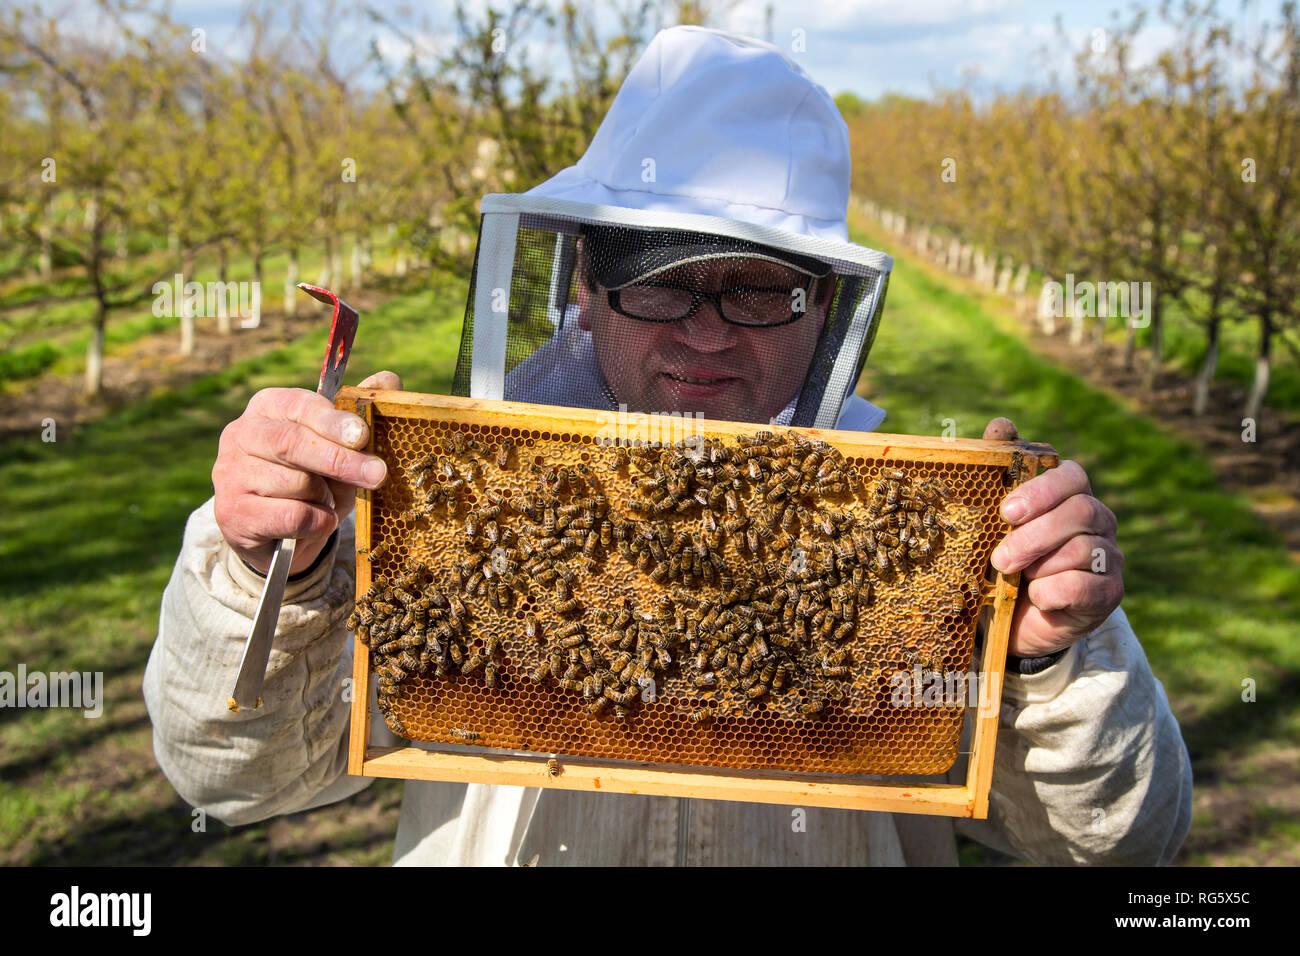 beekeeper controls honey bees, honeycomb, beehive, fruit cultivation, Imker kontrolliert Honigbienen, Honigwabe, Bienenstock, Obstanbau Stock Photo